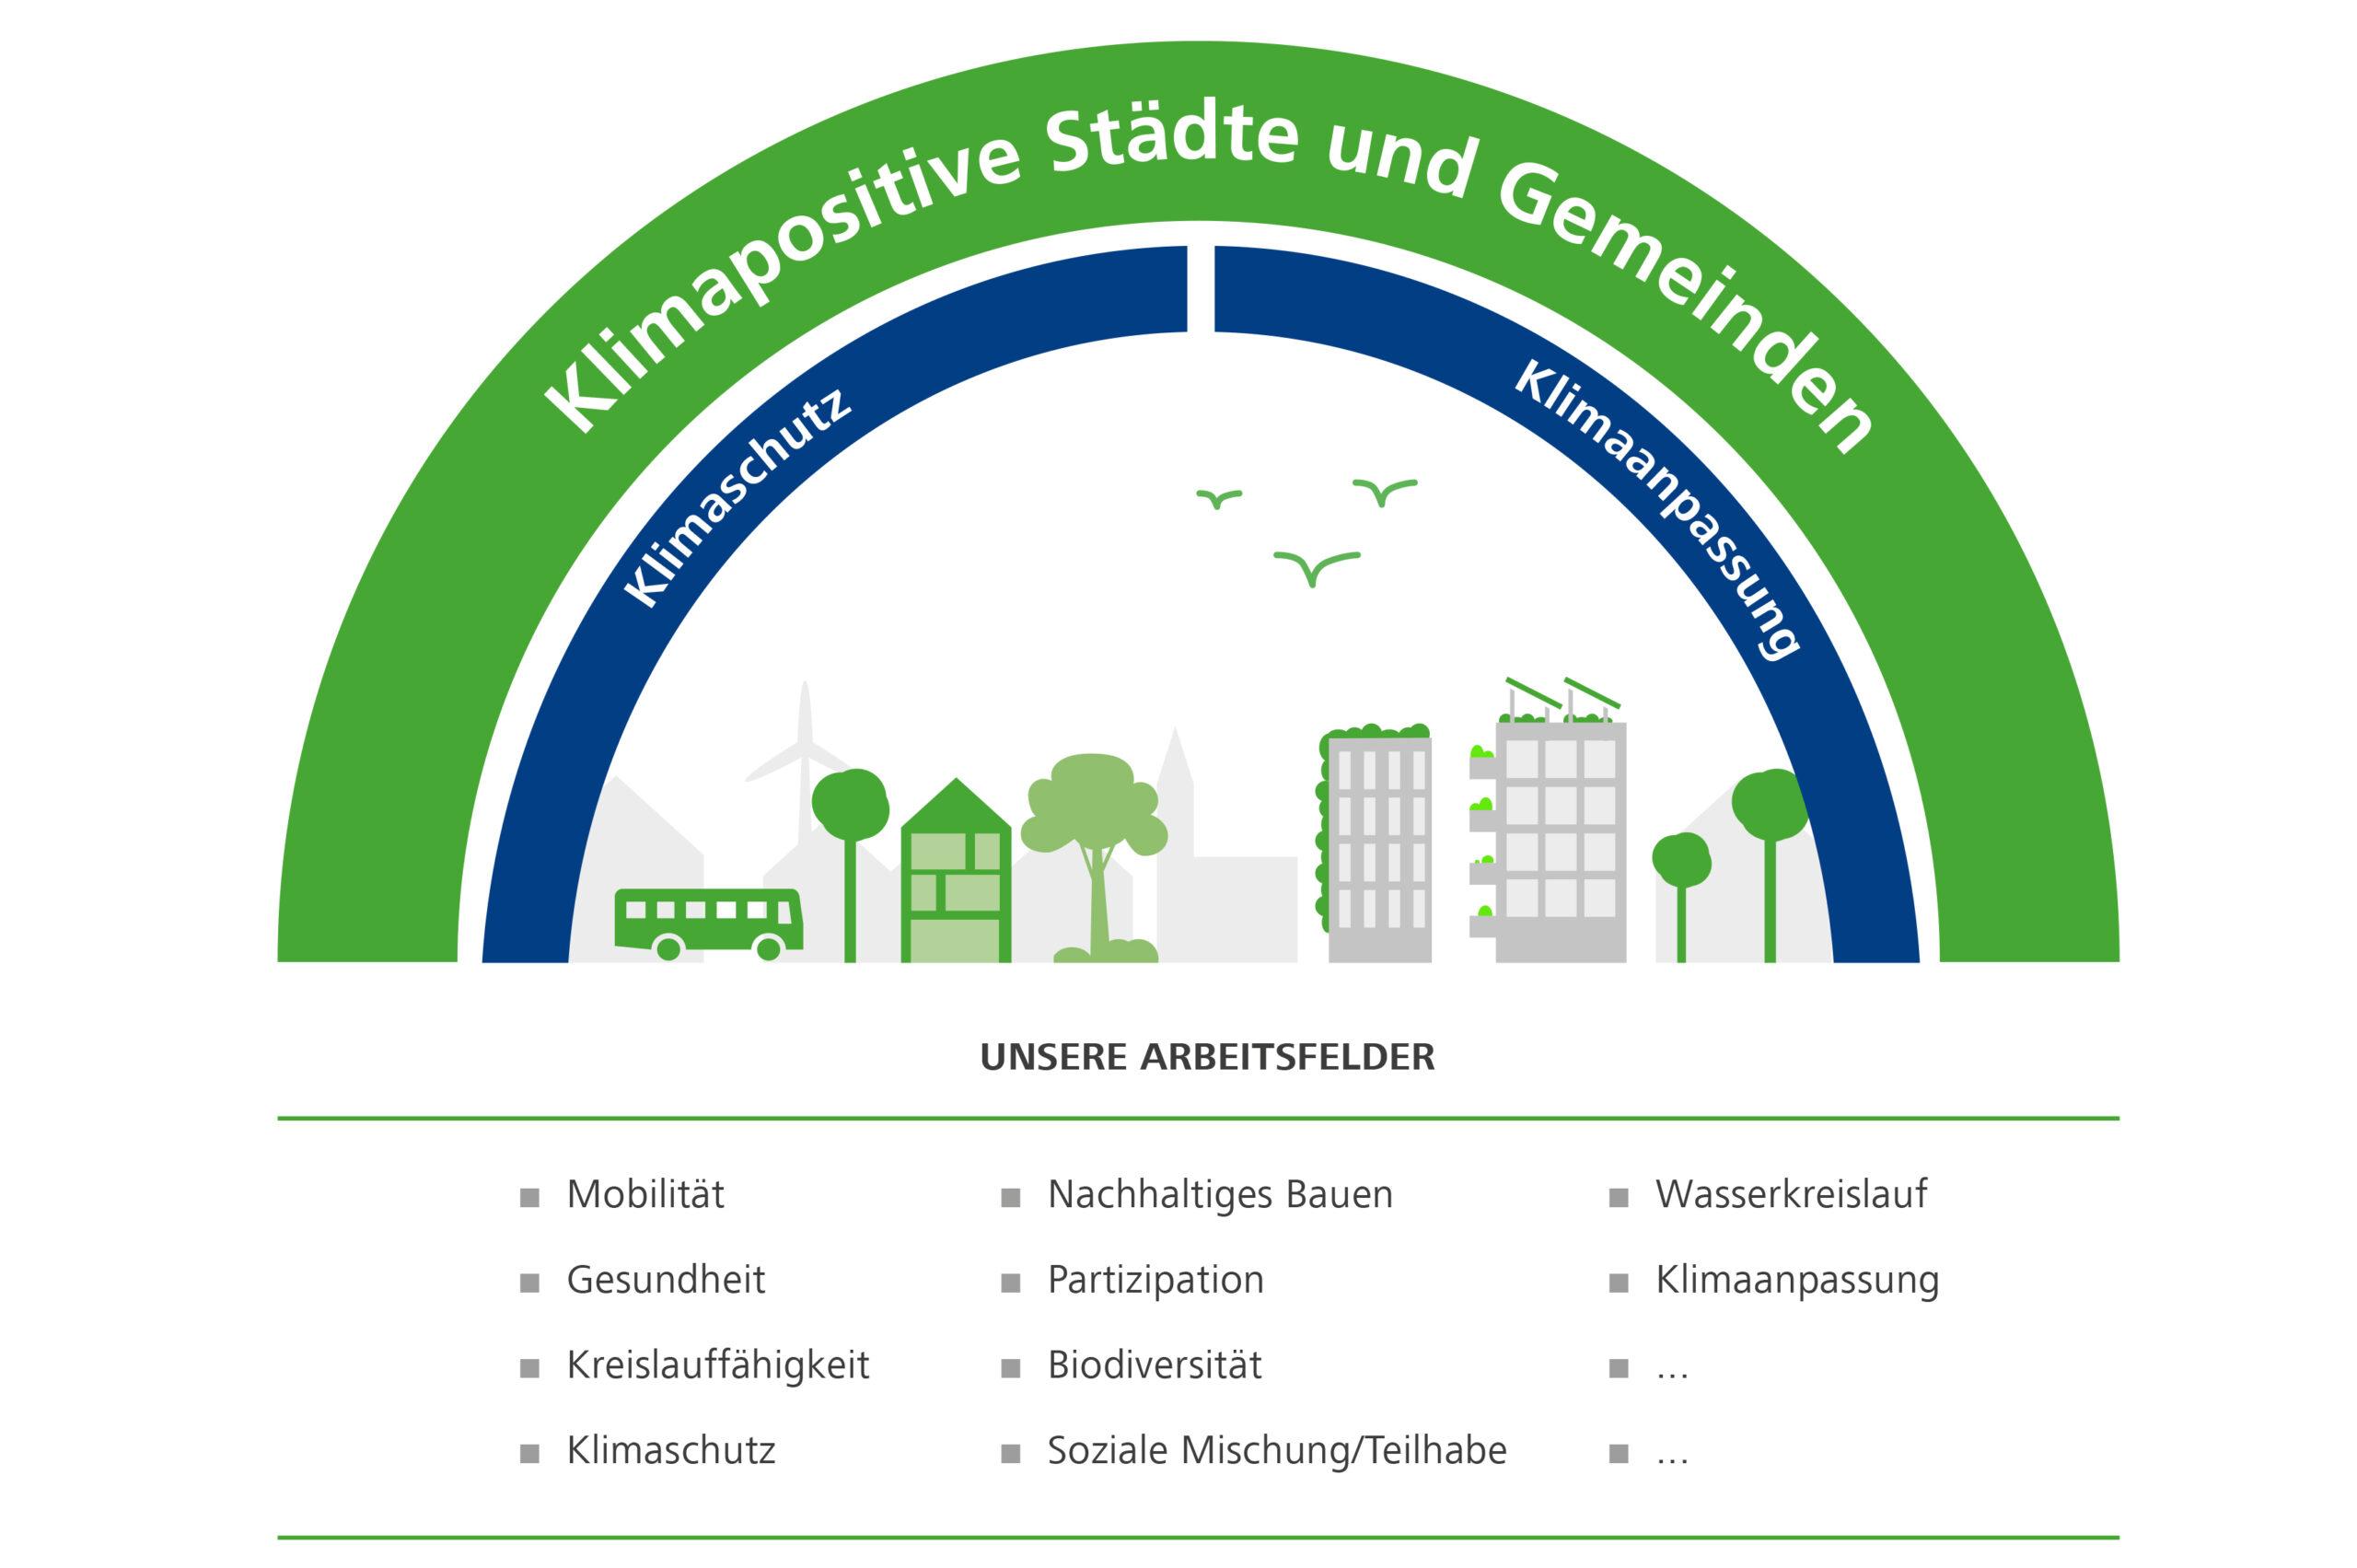 Klimapositive Stadt Arbeitsfelder